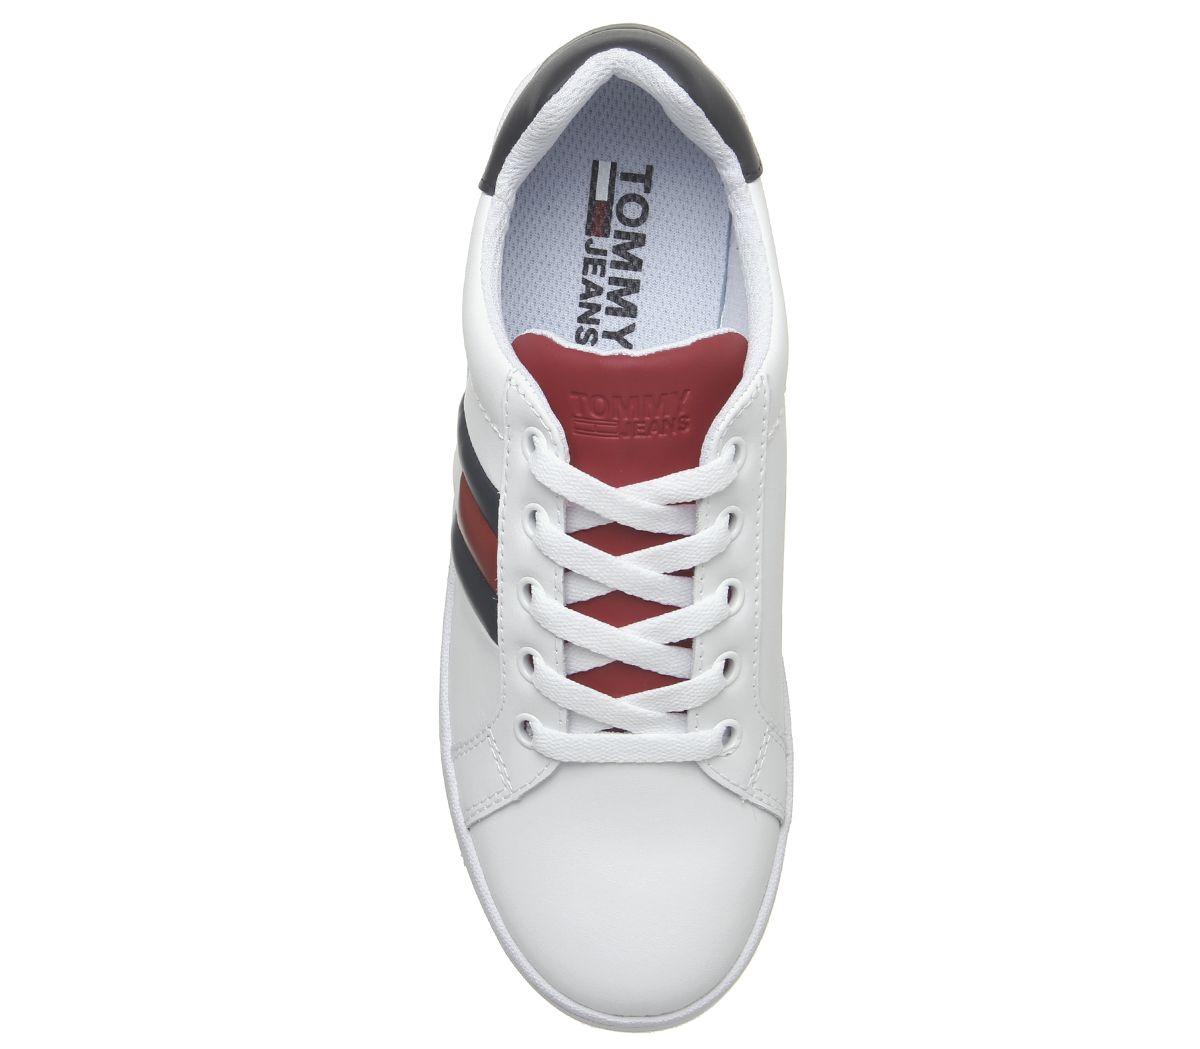 Chaussures Plateforme Femmes Drapeau Blanc Hilfiger Tommy Basket oWBxrdCe